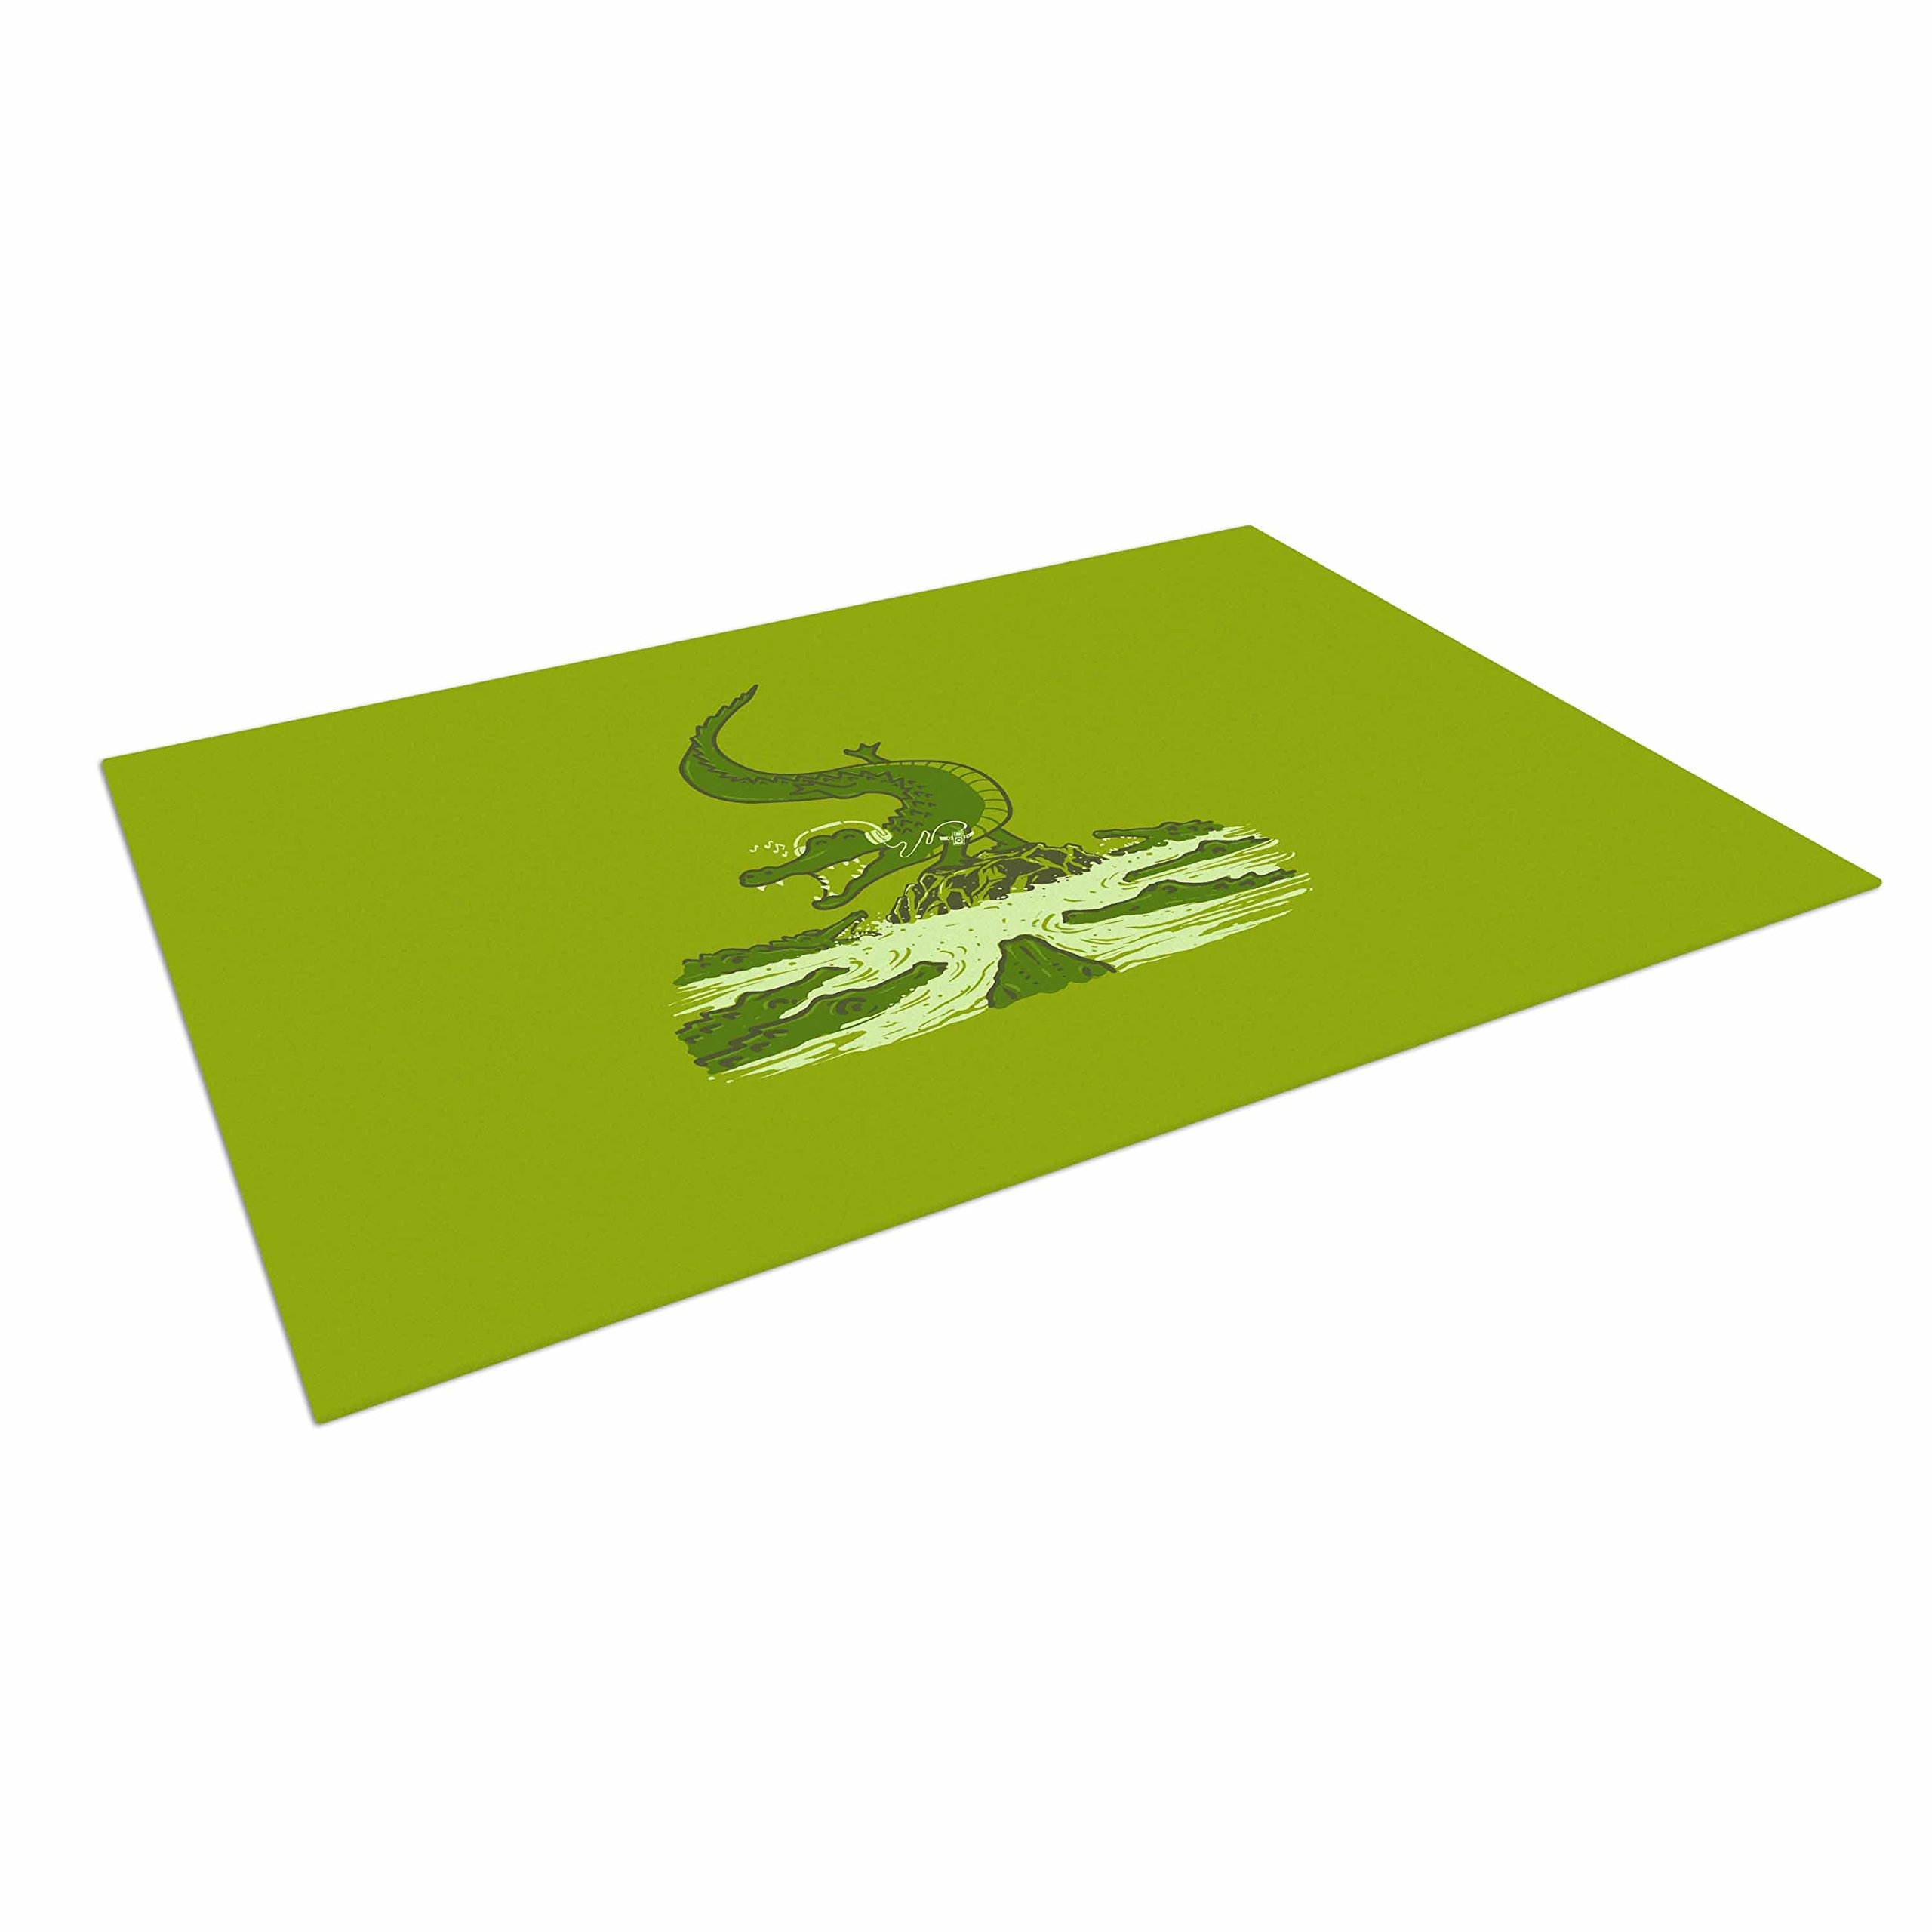 KESS InHouse BarmalisiRTB ''Breakdance Crocodile'' Green Beige Outdoor Floor Mat, 4' x 5'